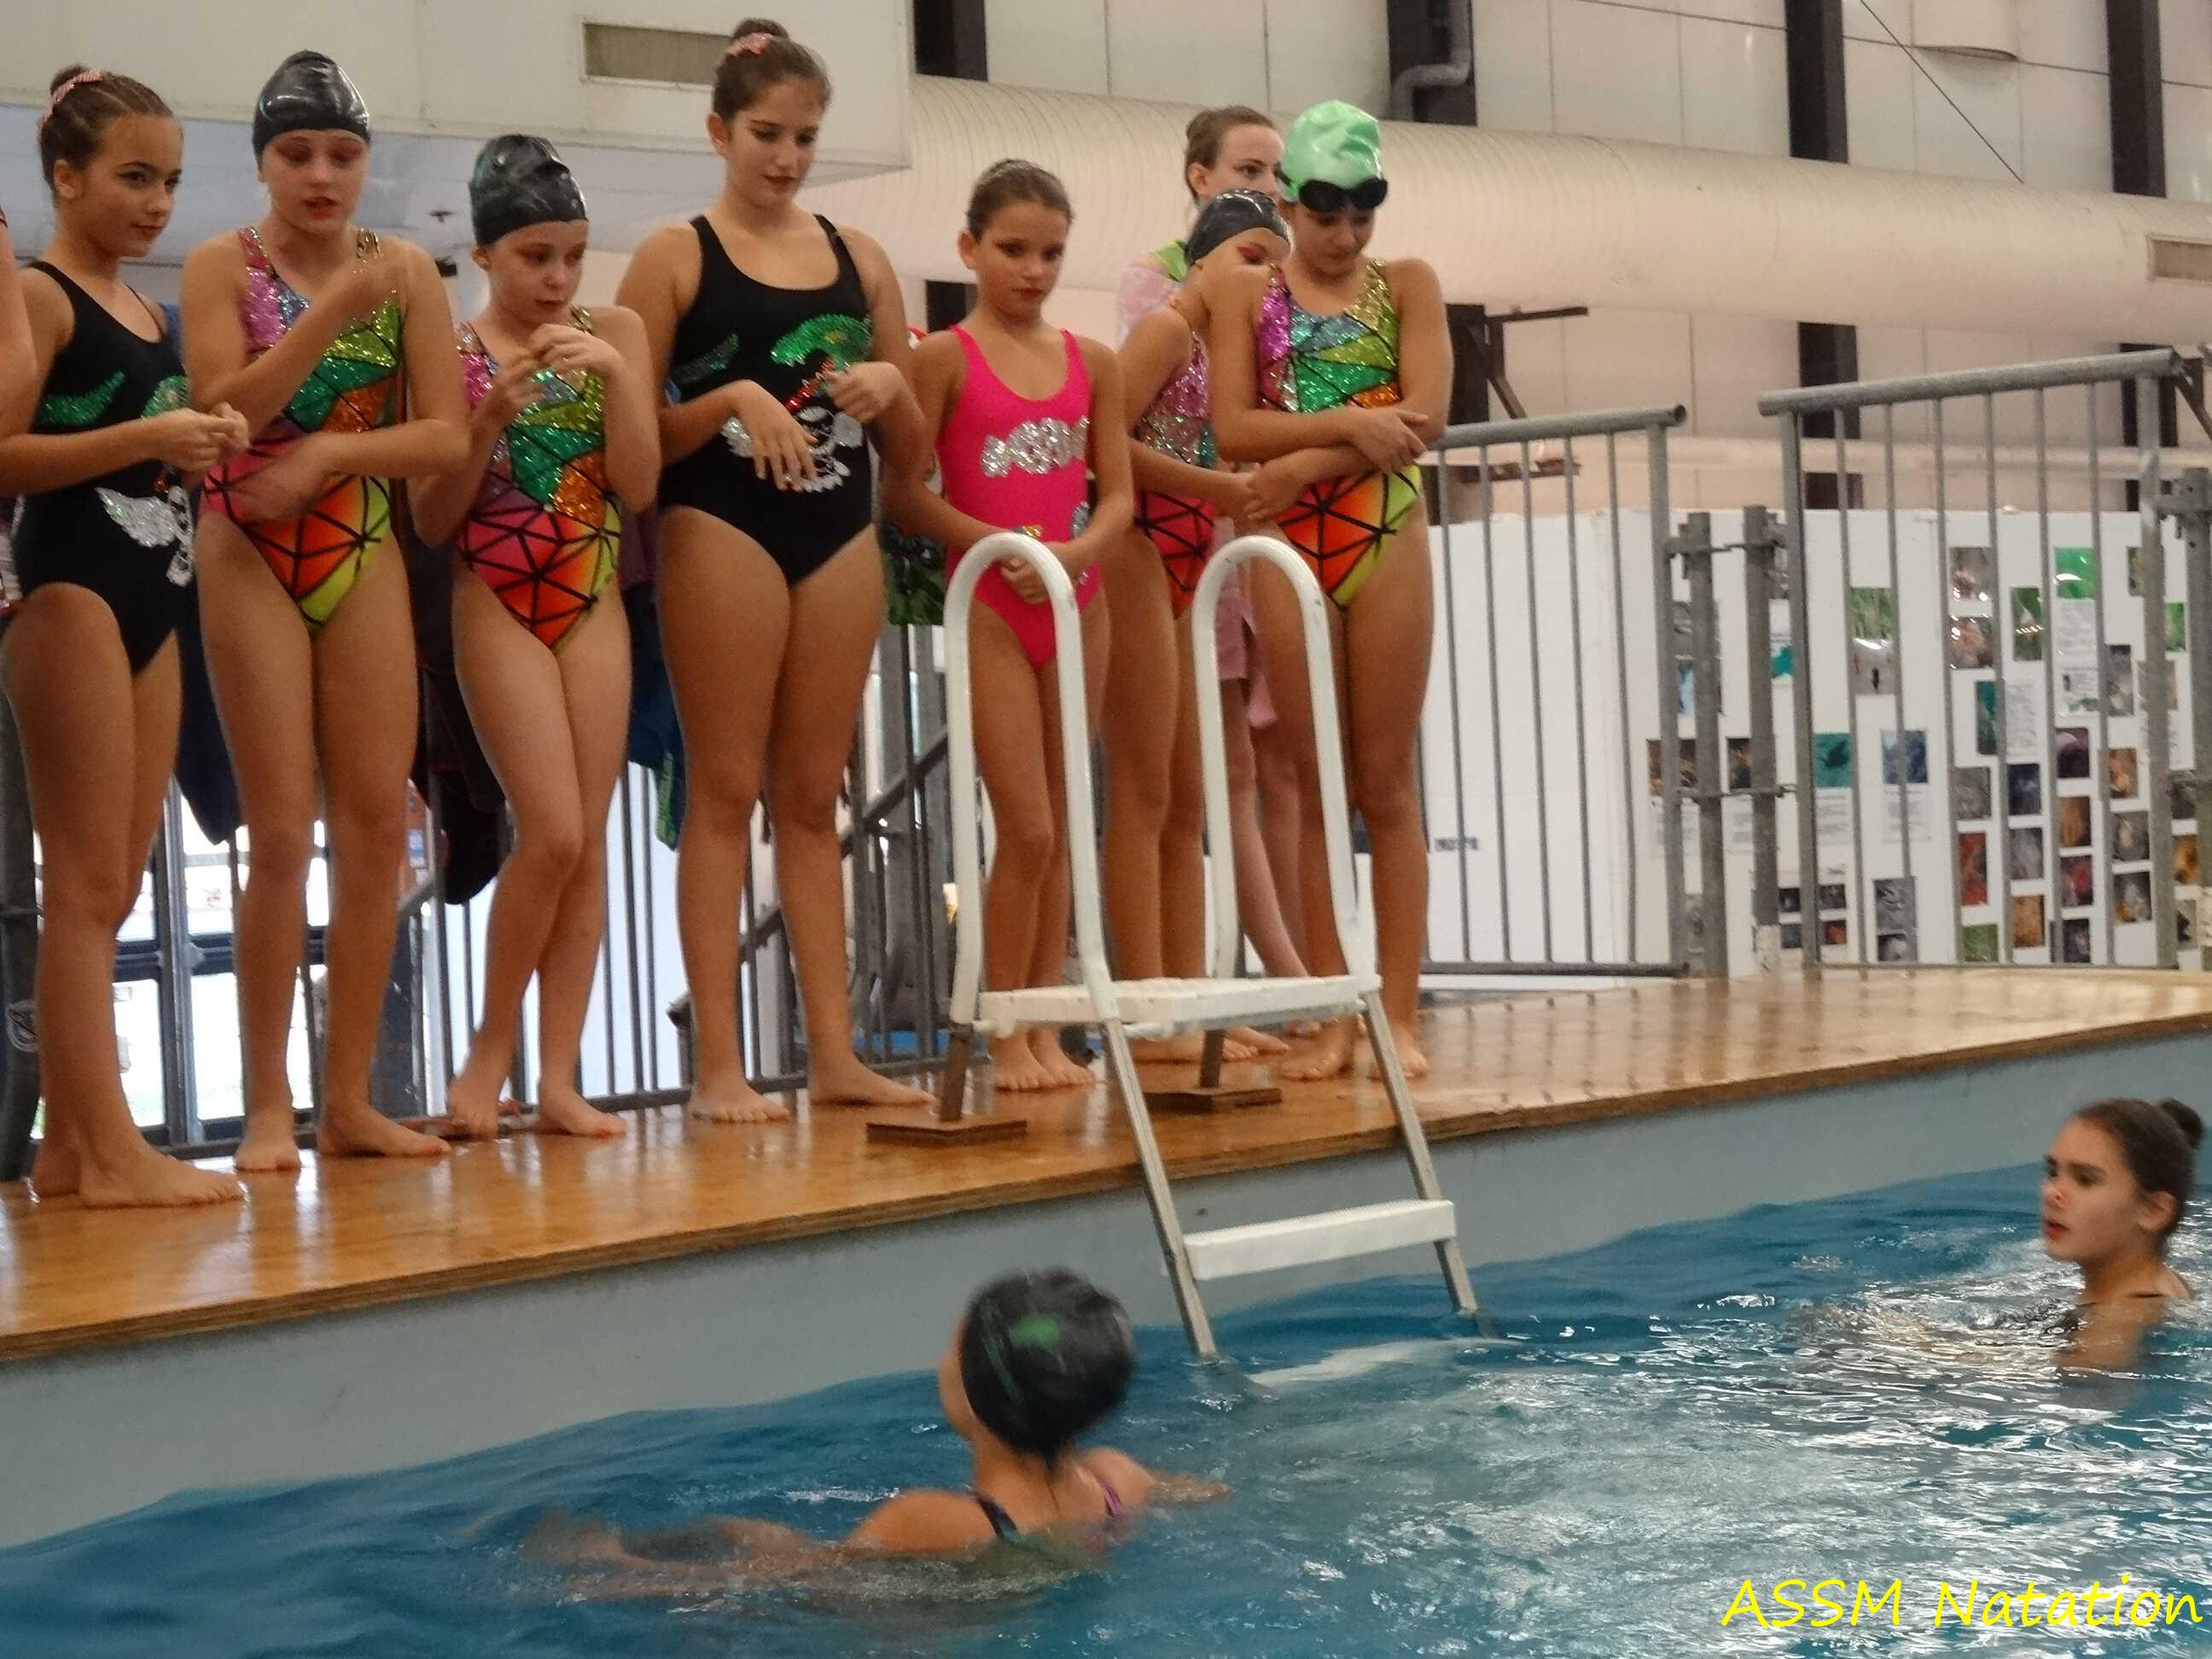 salon-vivons-sports_20161113_8